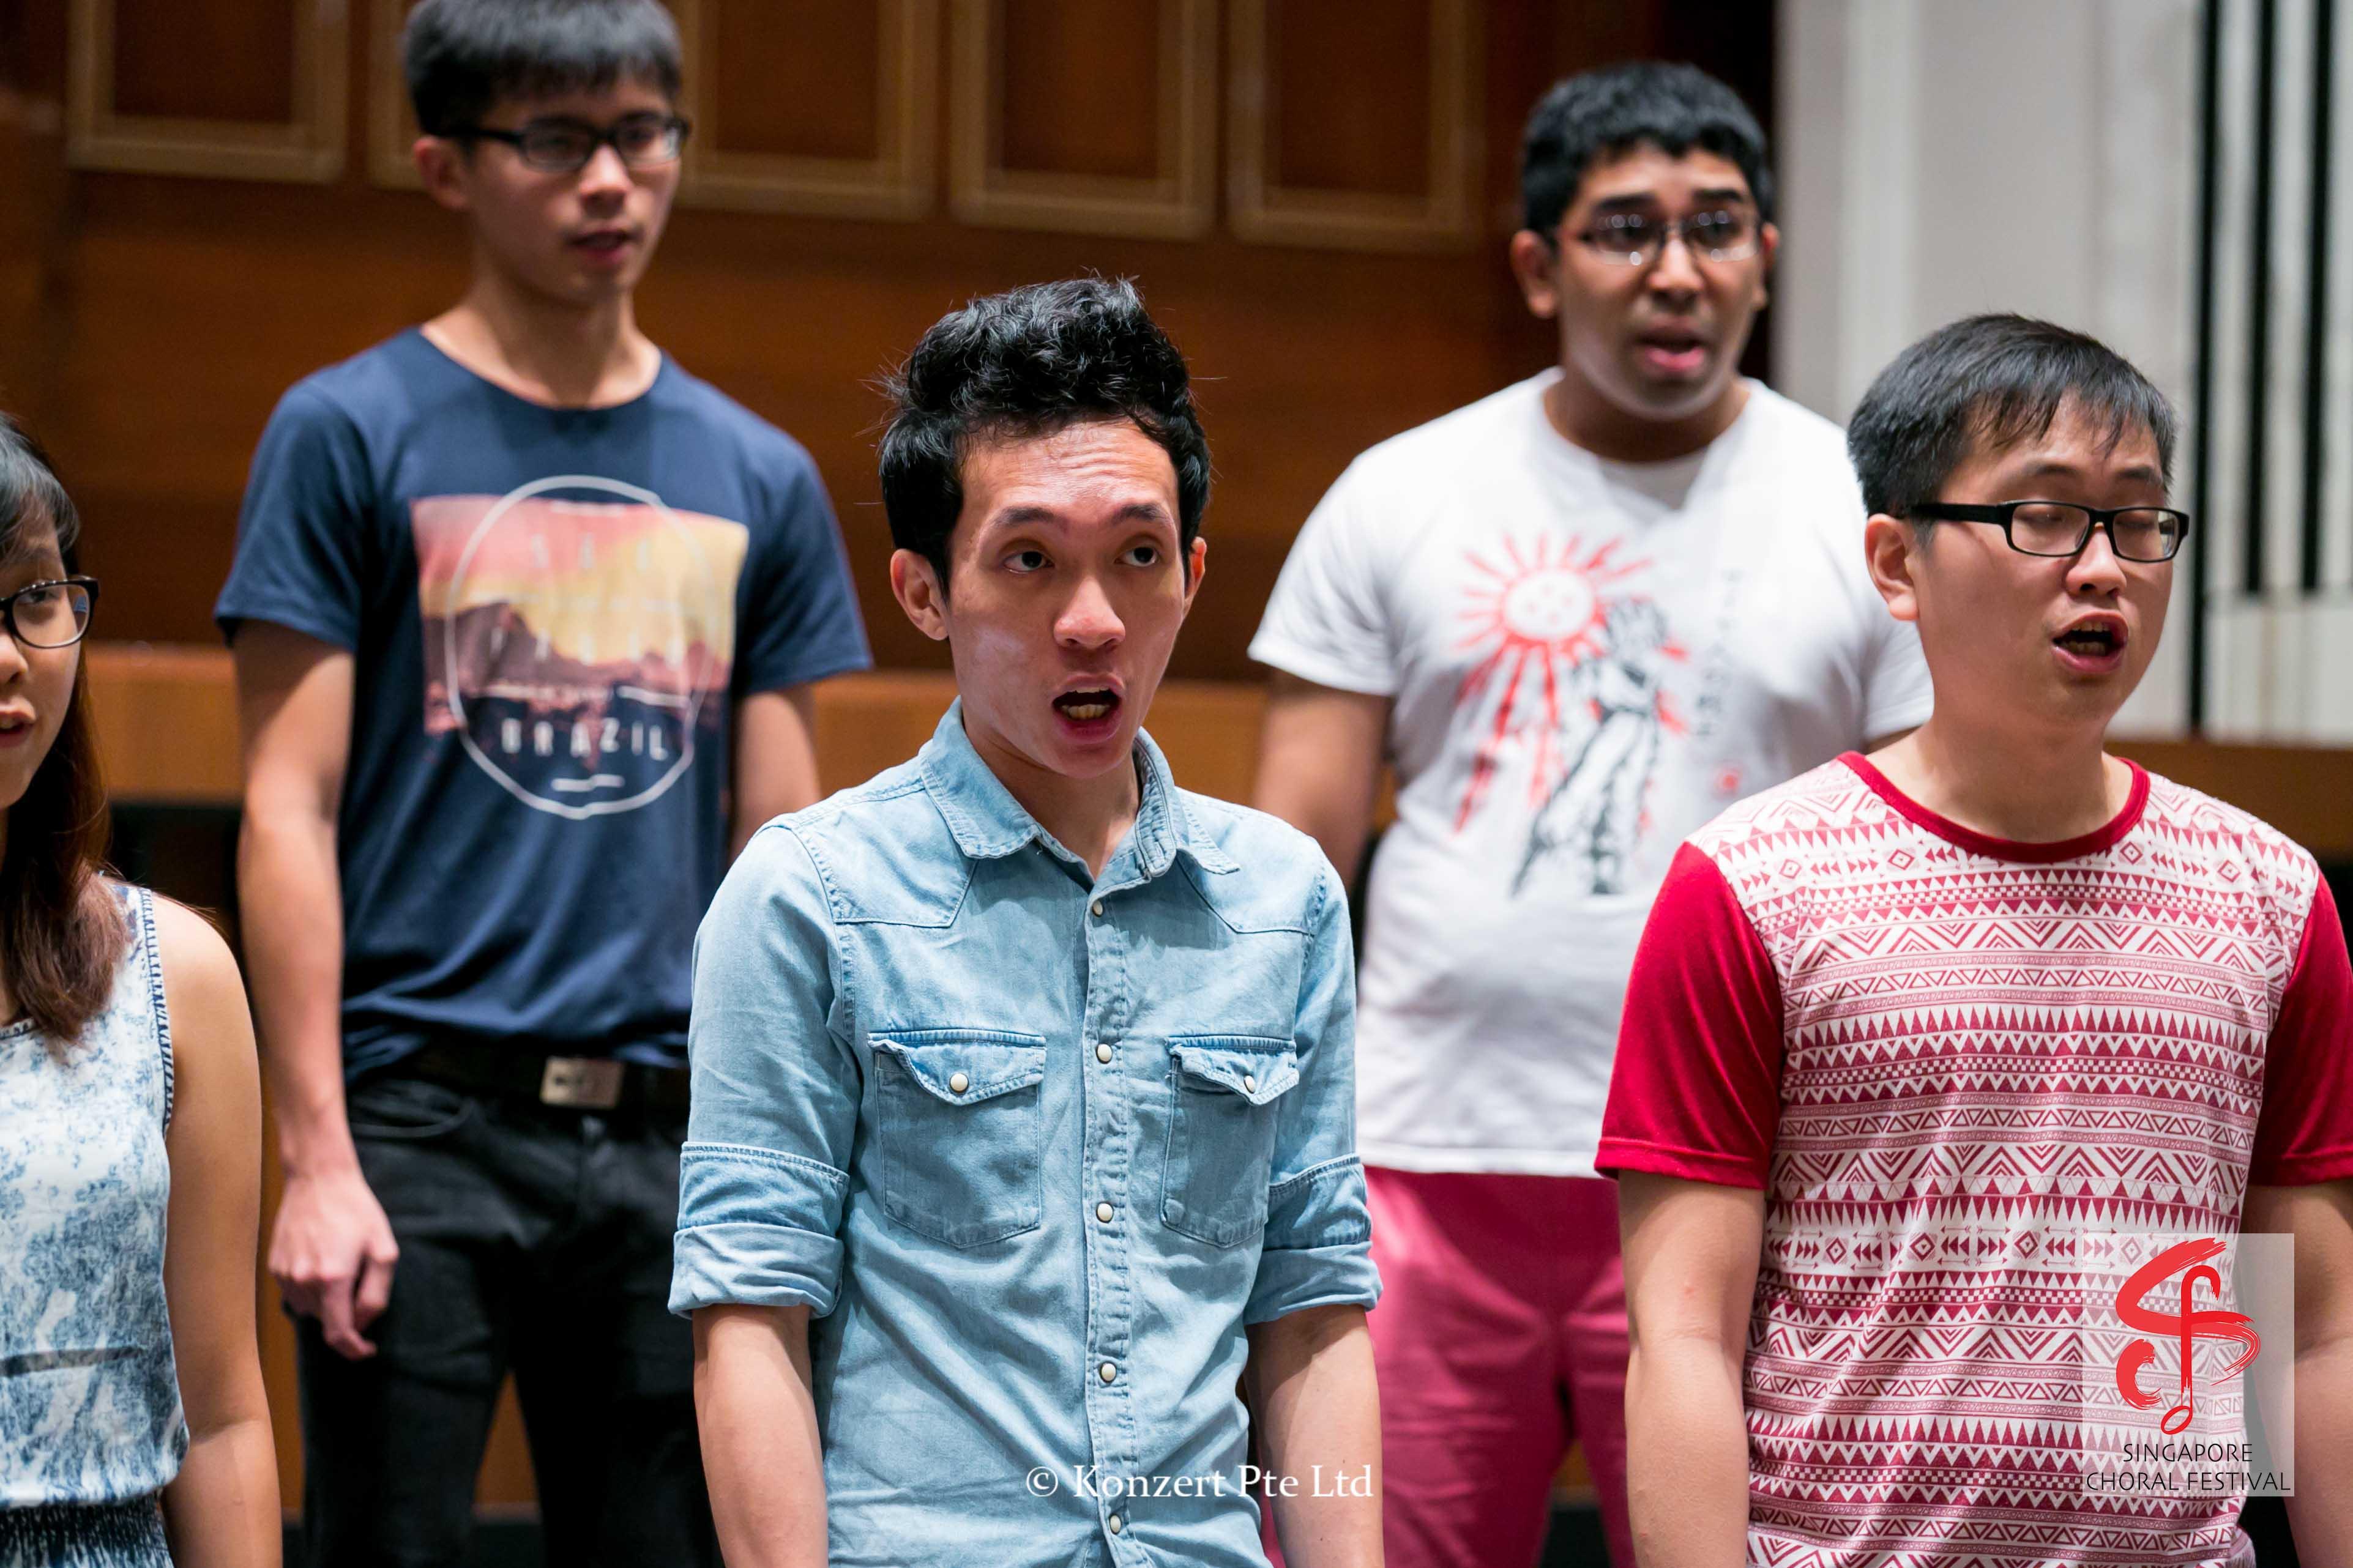 Singapore Choral Festival 7-8-15 (114).jpg